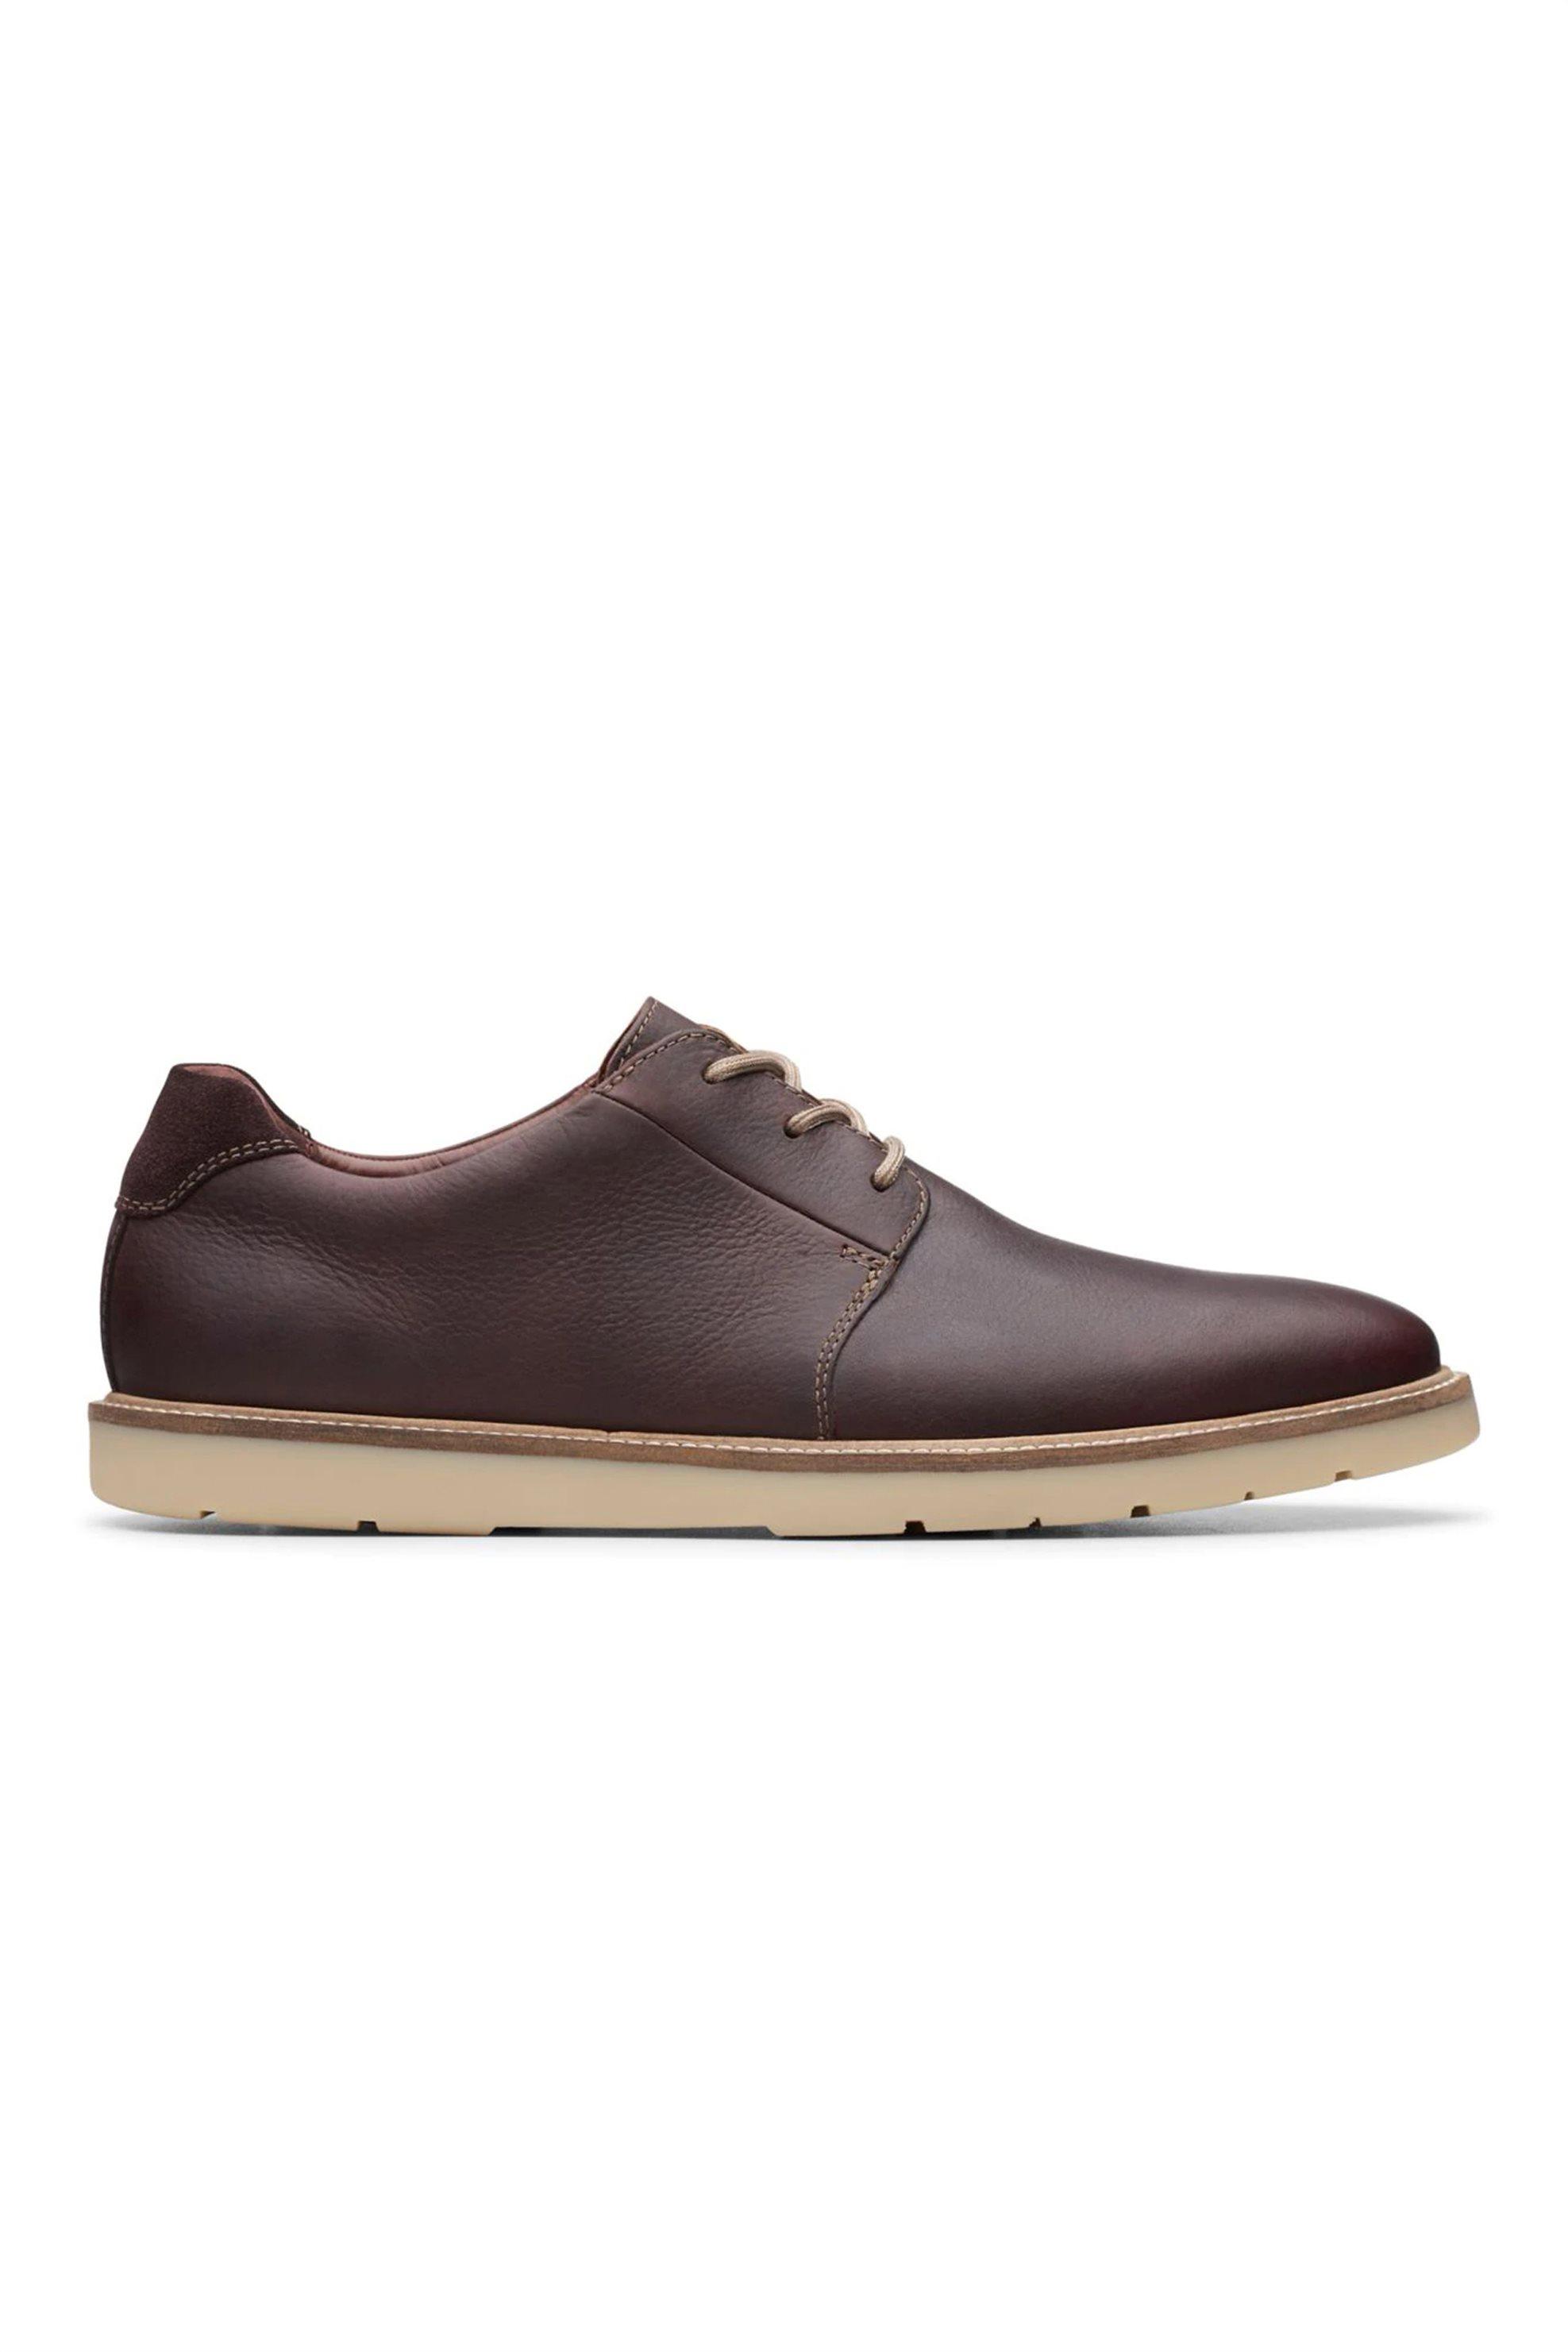 Clarks ανδρικά δερμάτινα παπούτσια «Grandin Plain» – 26141923 – Καφέ